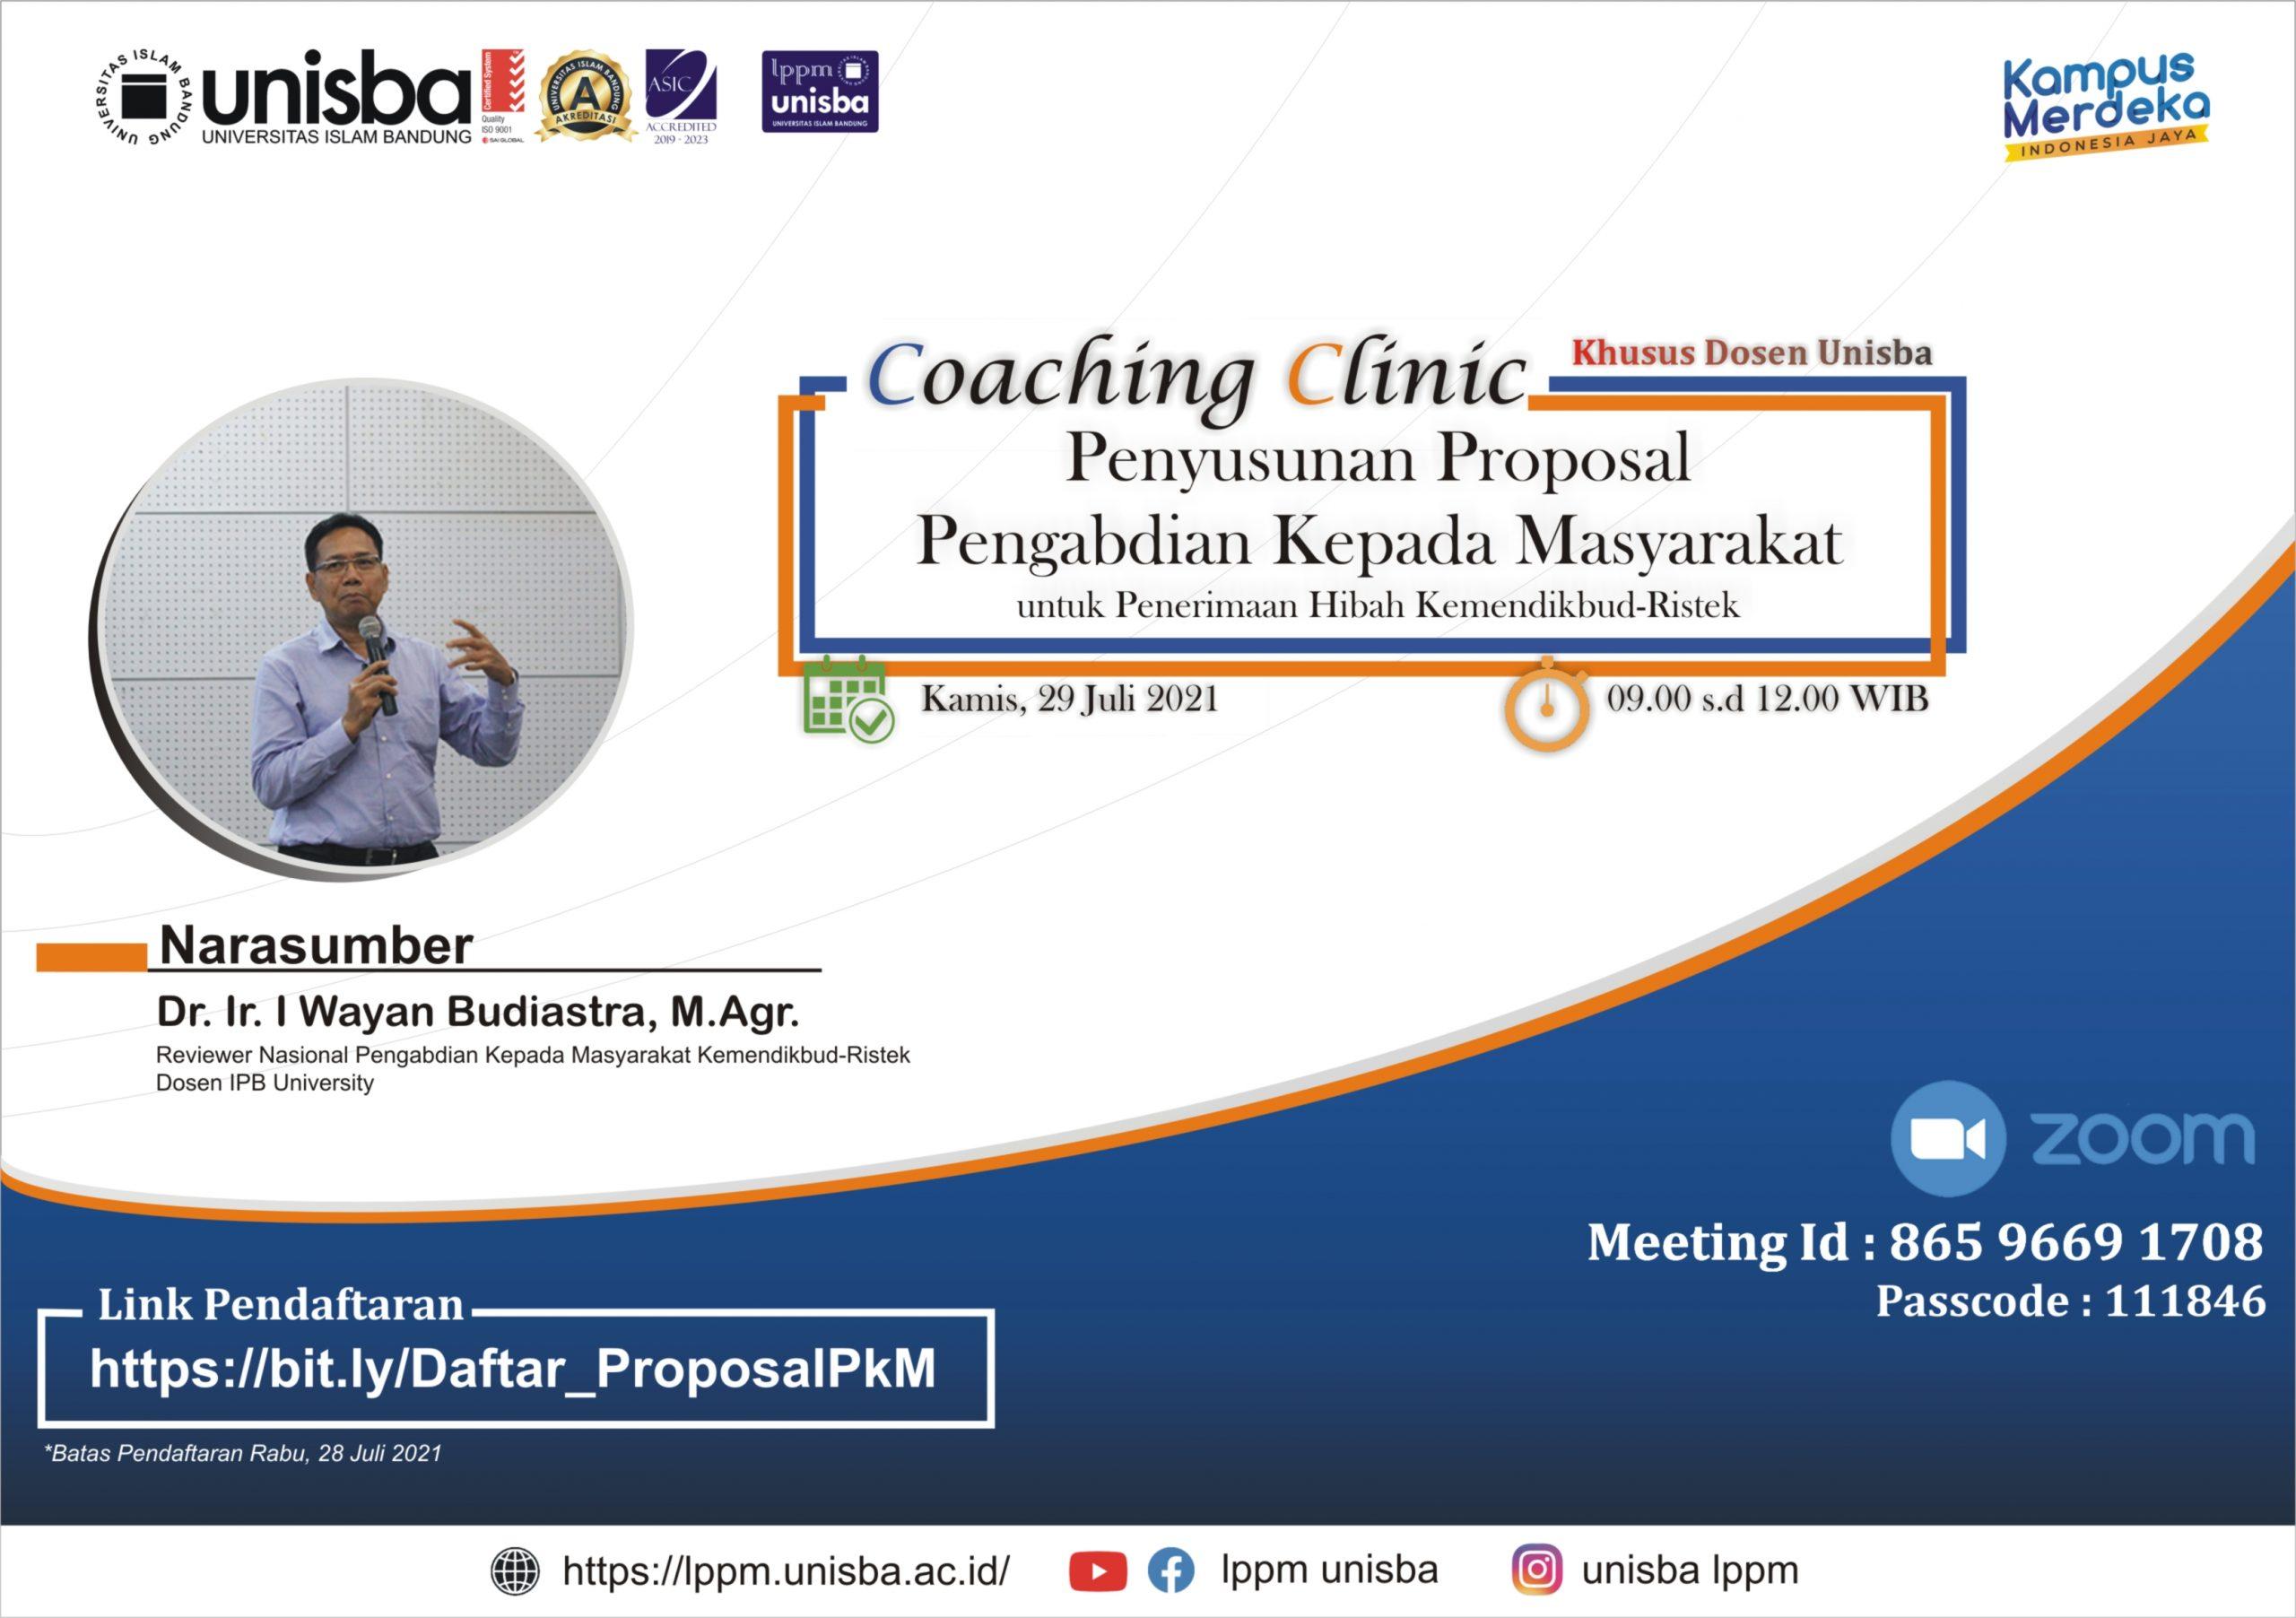 Coaching Clinic Penyusunan Proposal PkM untuk Hibah Kemendikbud-Ristek